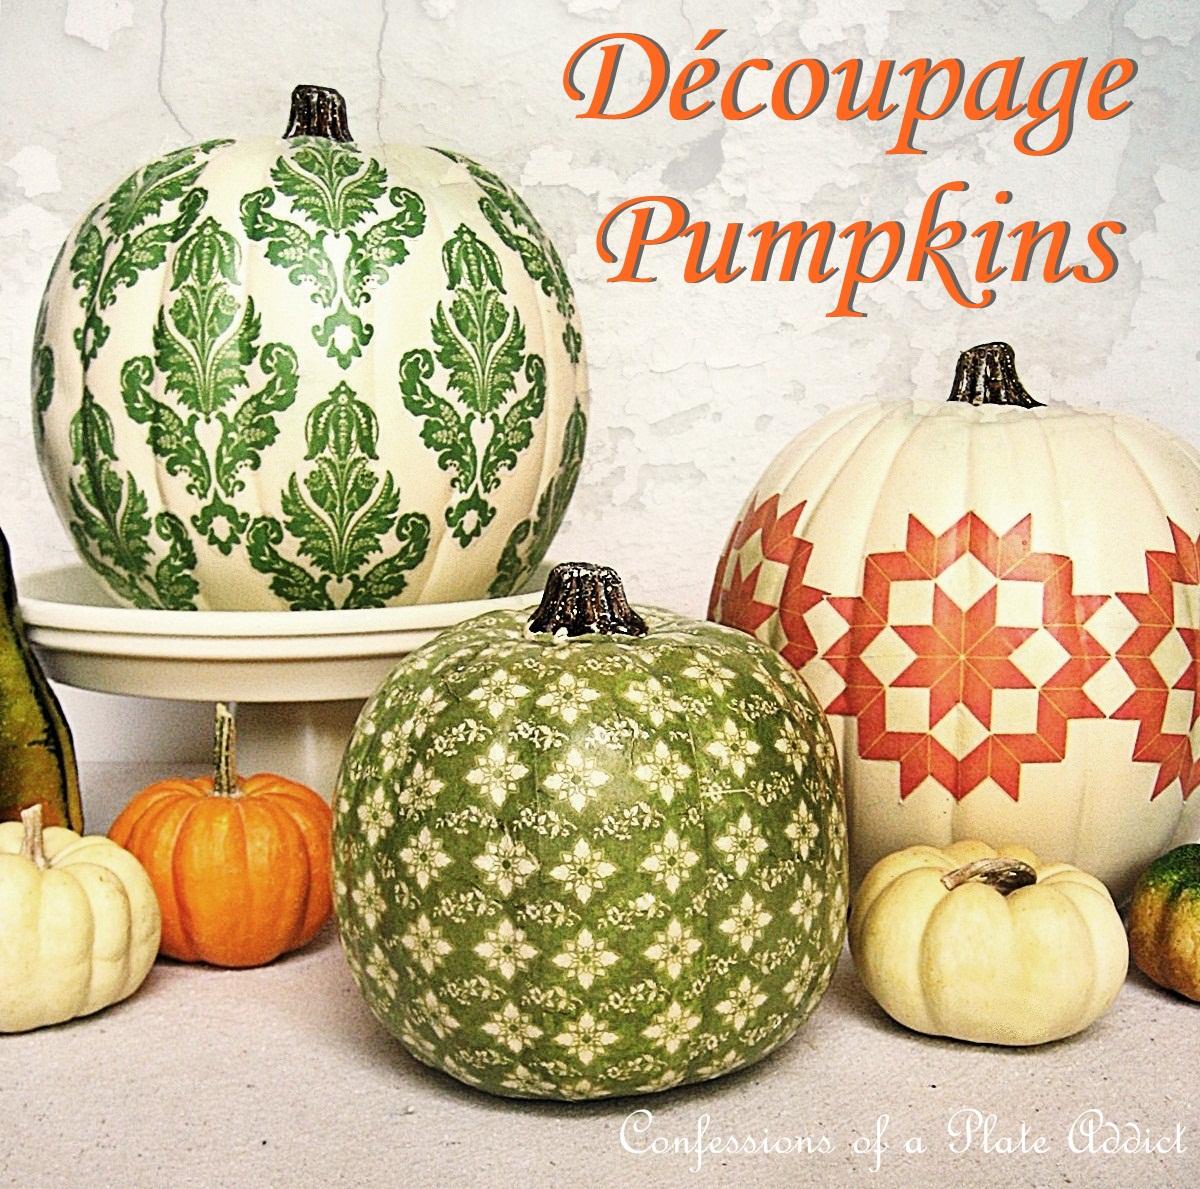 DECK THE HOLIDAY'S: DIY DECOUPAGE PUMPKINS!!!!